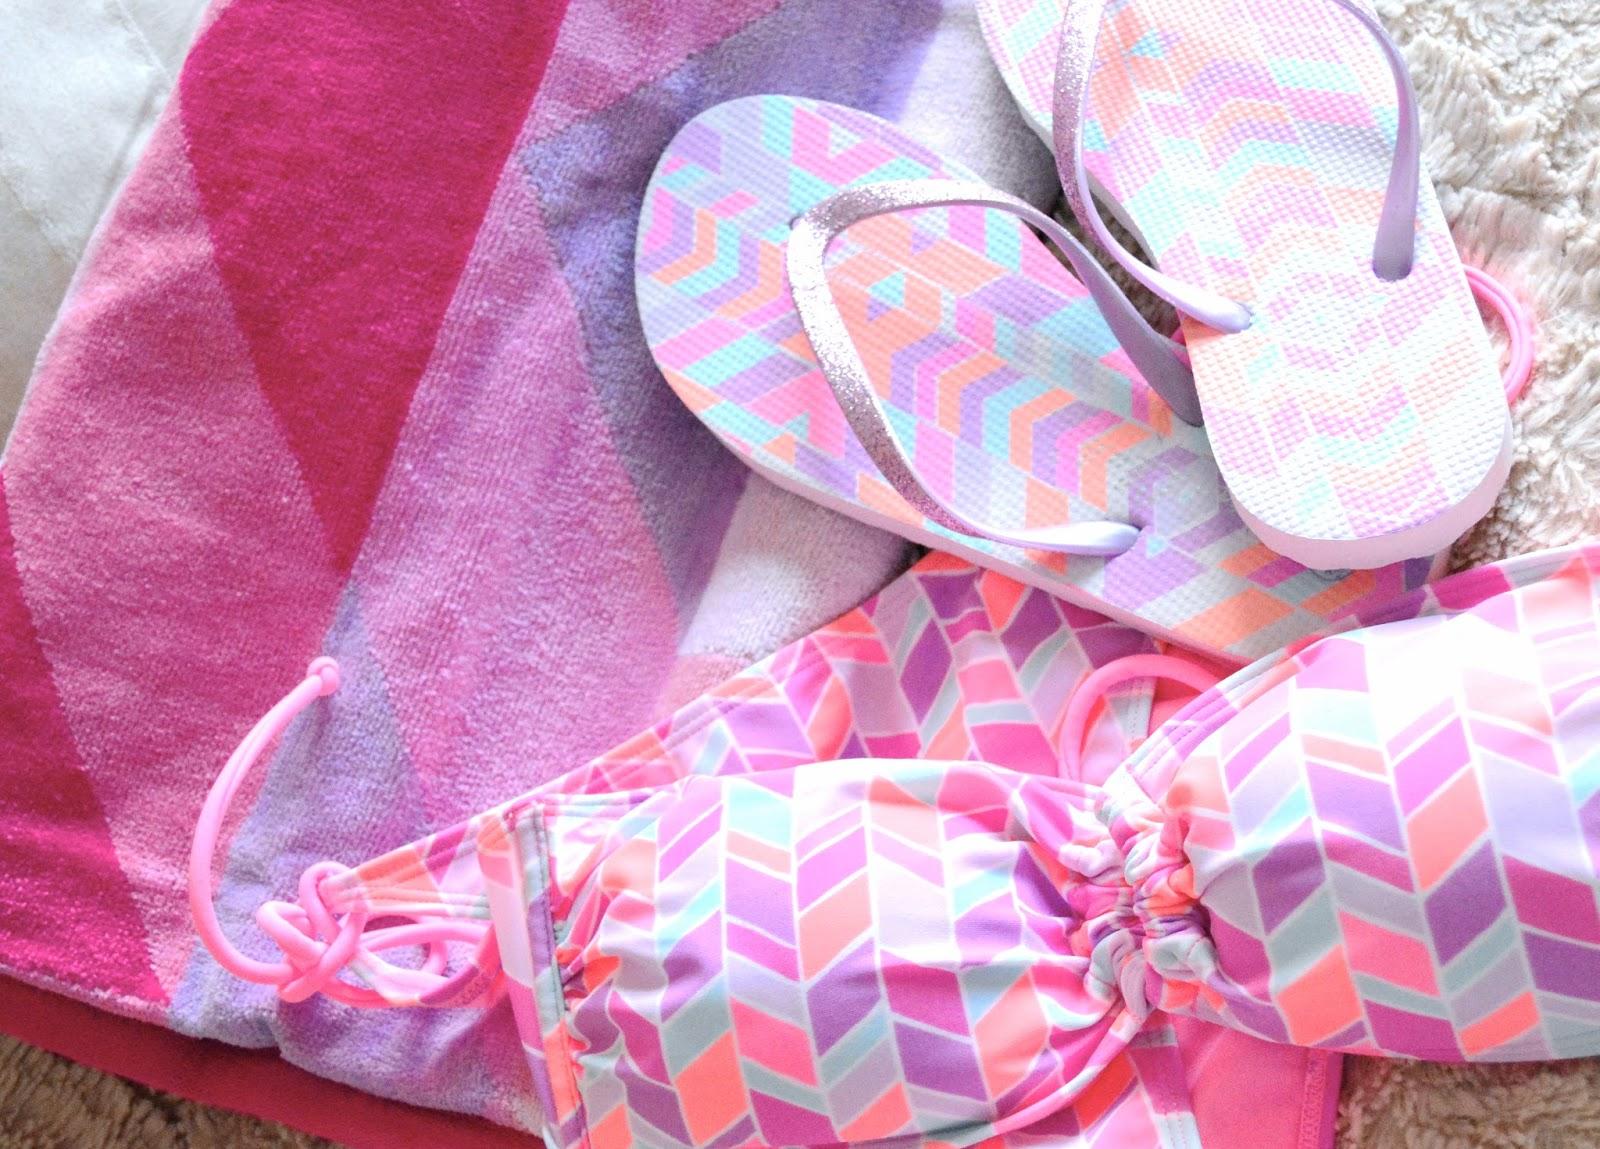 Primark Bikini, Primark Haul, Primark Flip Flops, Primark Beach Towel, Pink Geometric Design